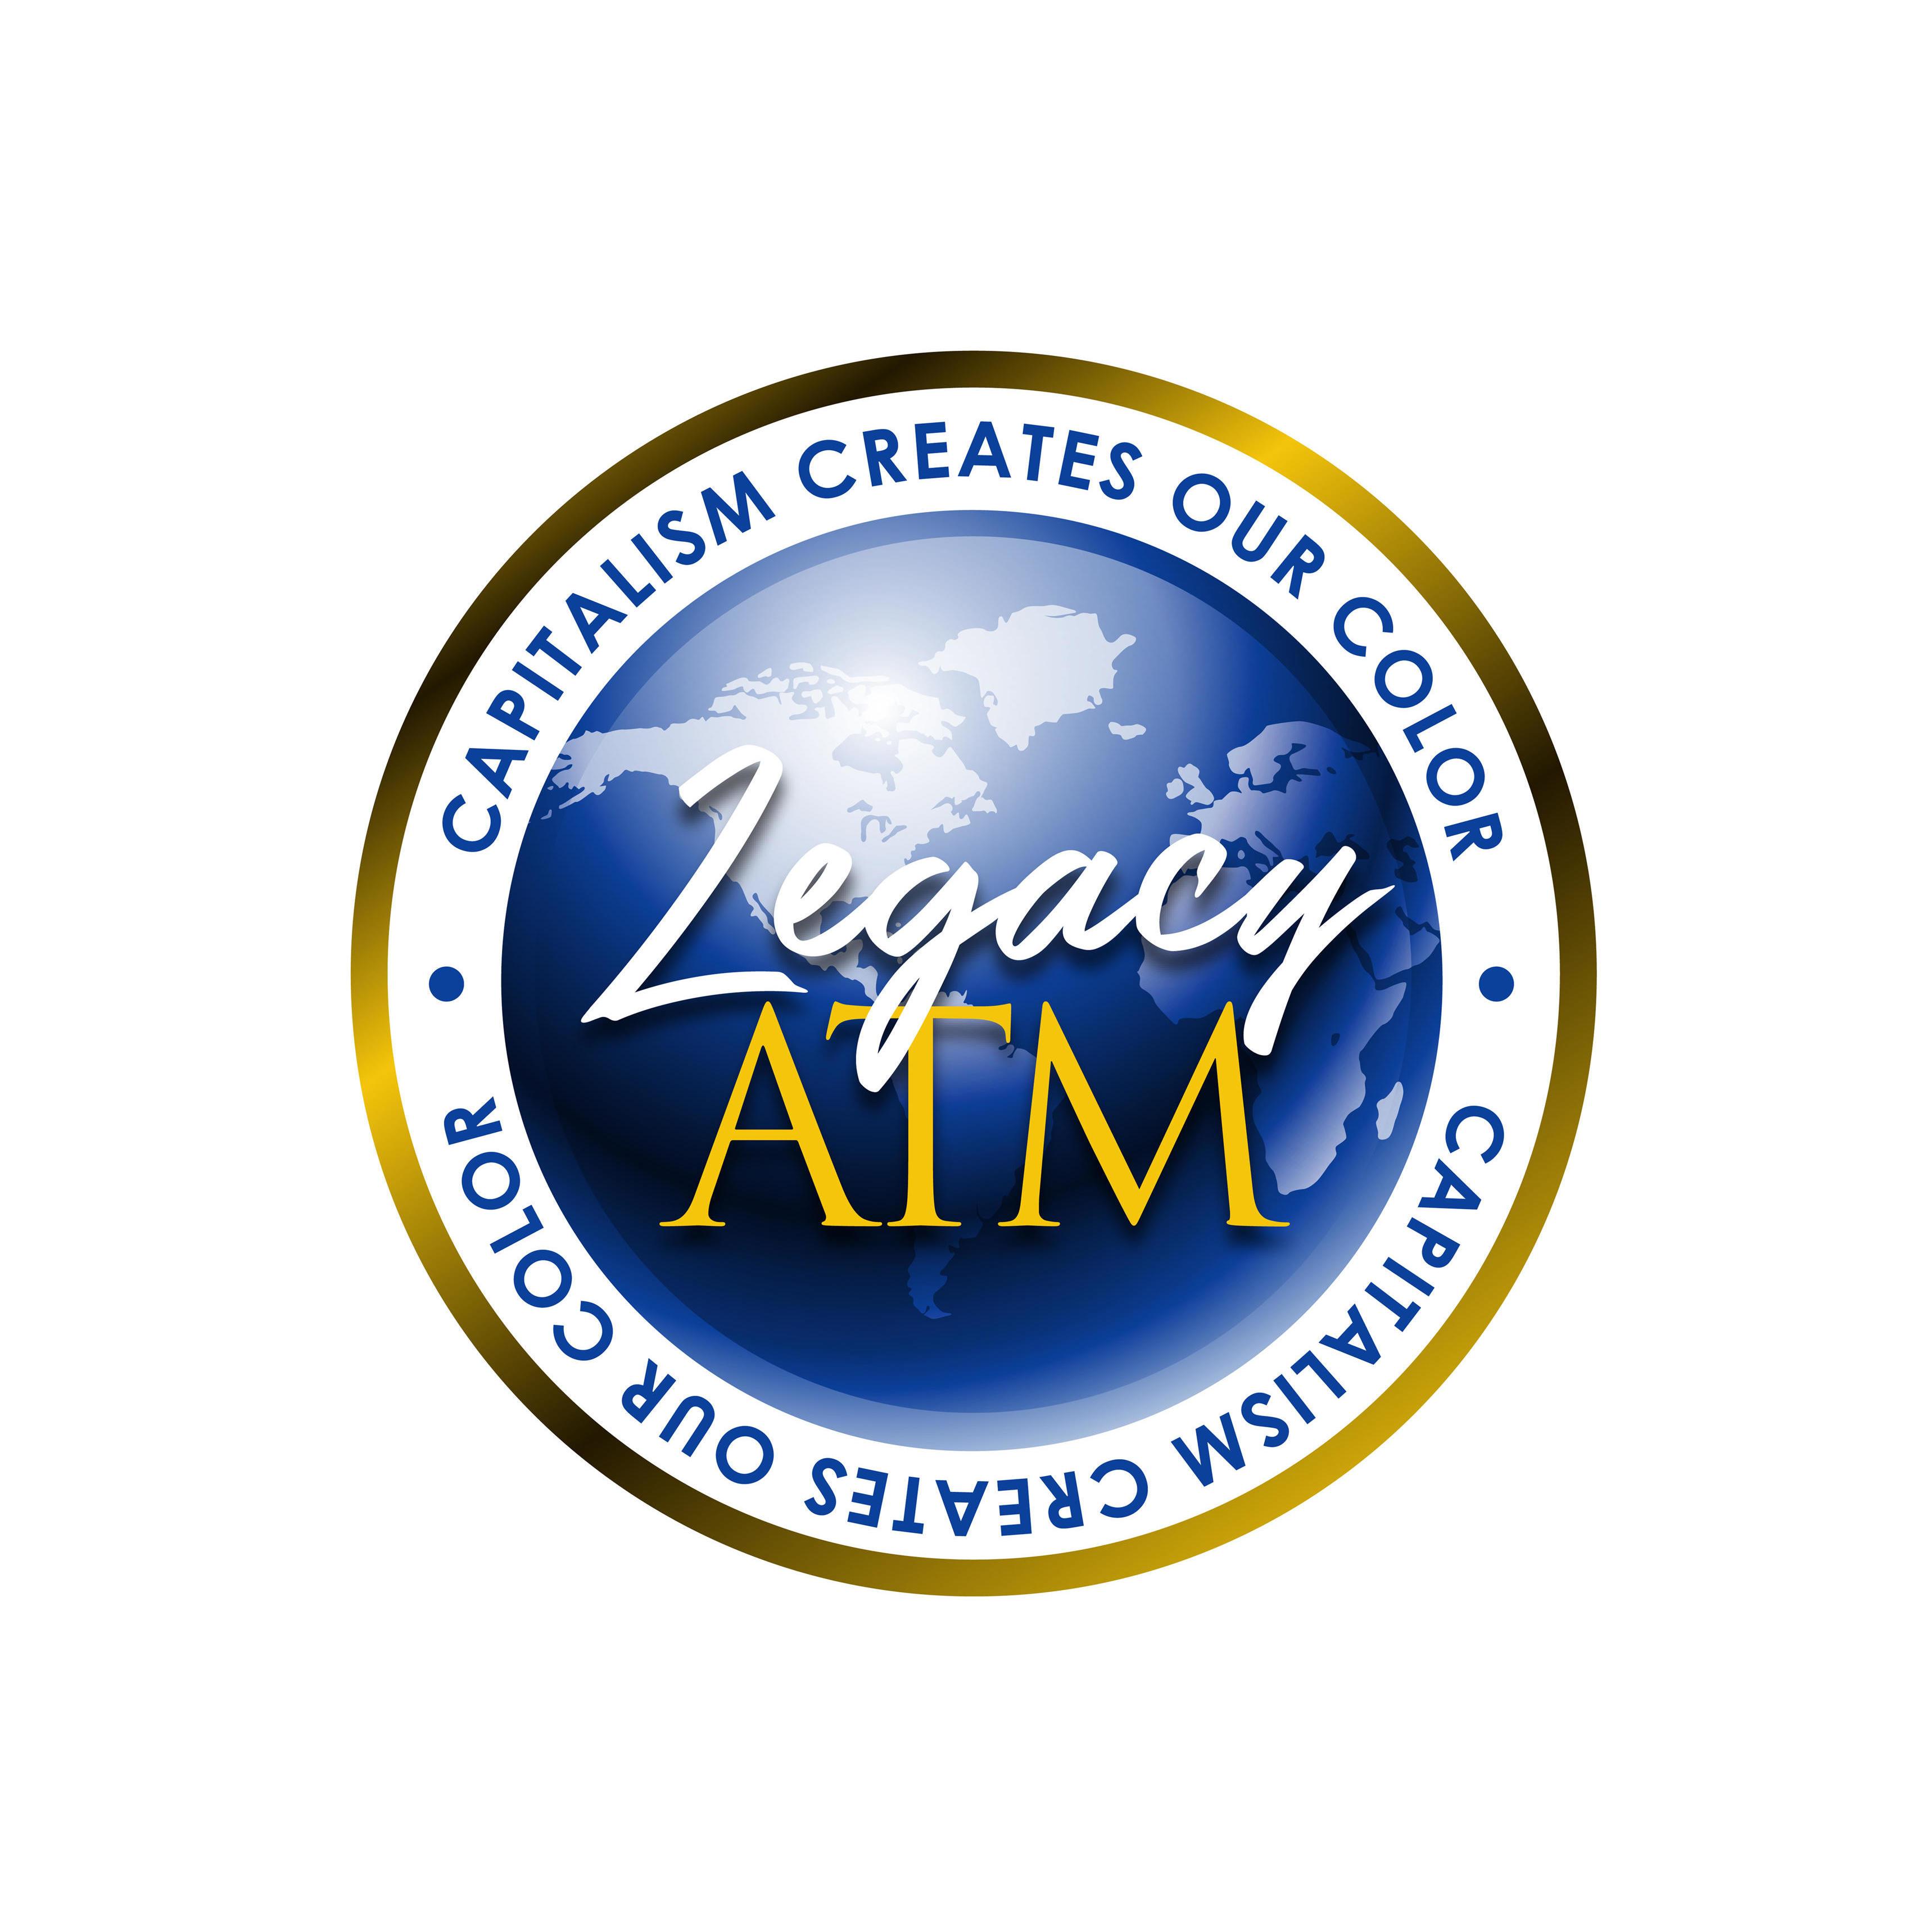 Legacy ATM